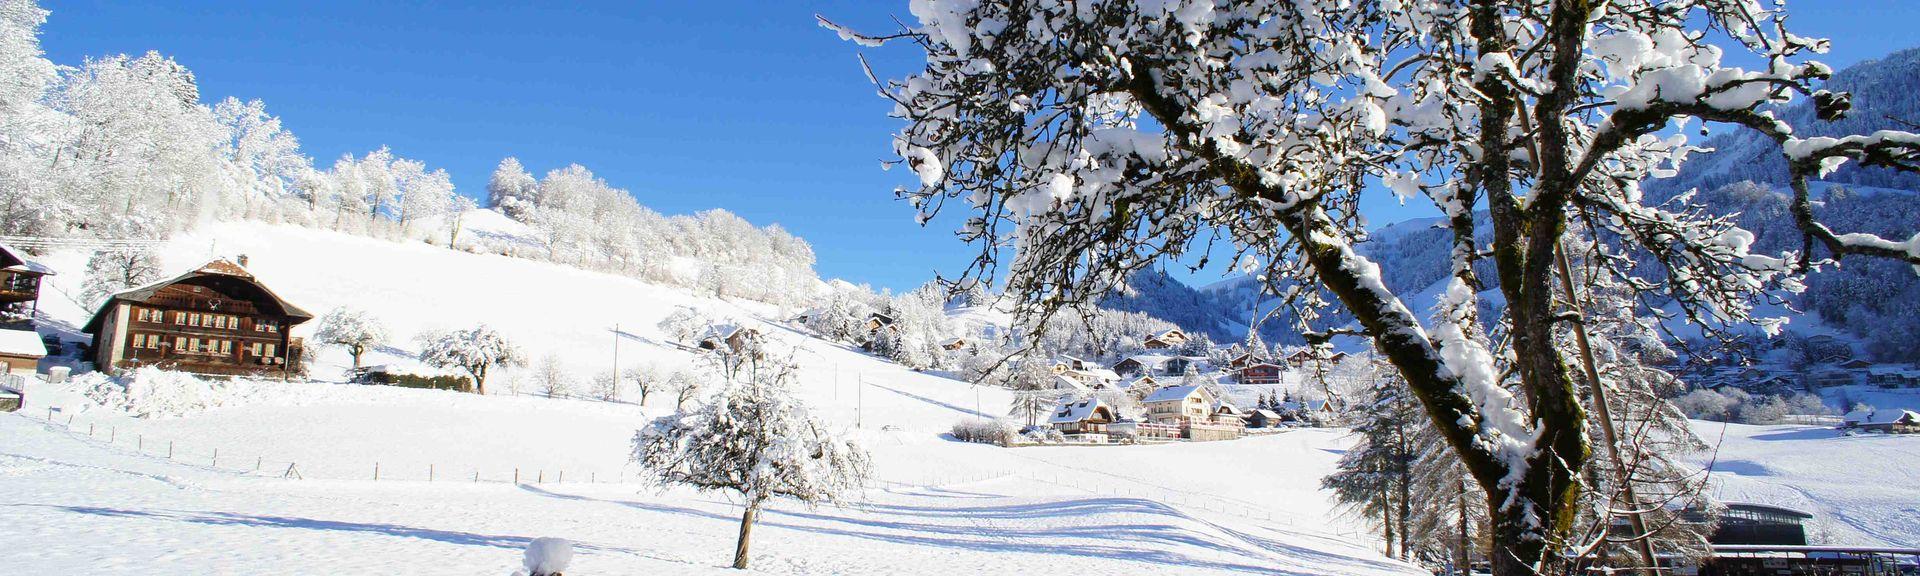 Charmey, Canton of Fribourg, Switzerland